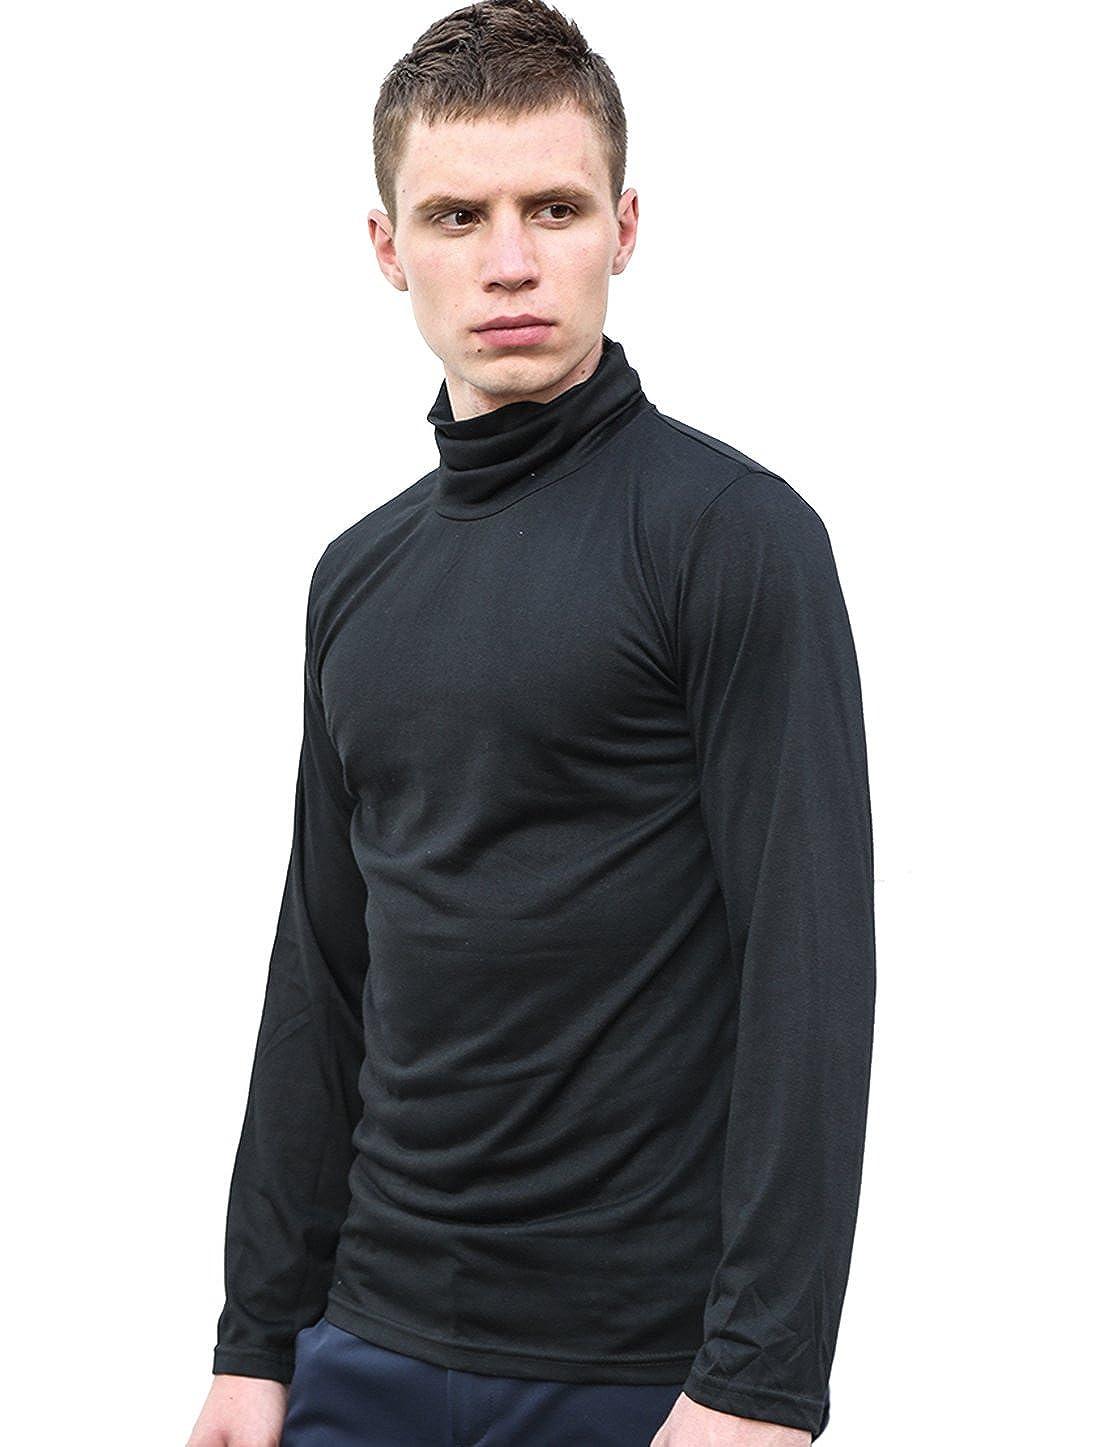 Uxcell Men Slim Fit Lightweight Long Sleeve Pullover Top Turtleneck Acrylick Online Men39s Short Circuit Tshirt T Shirt